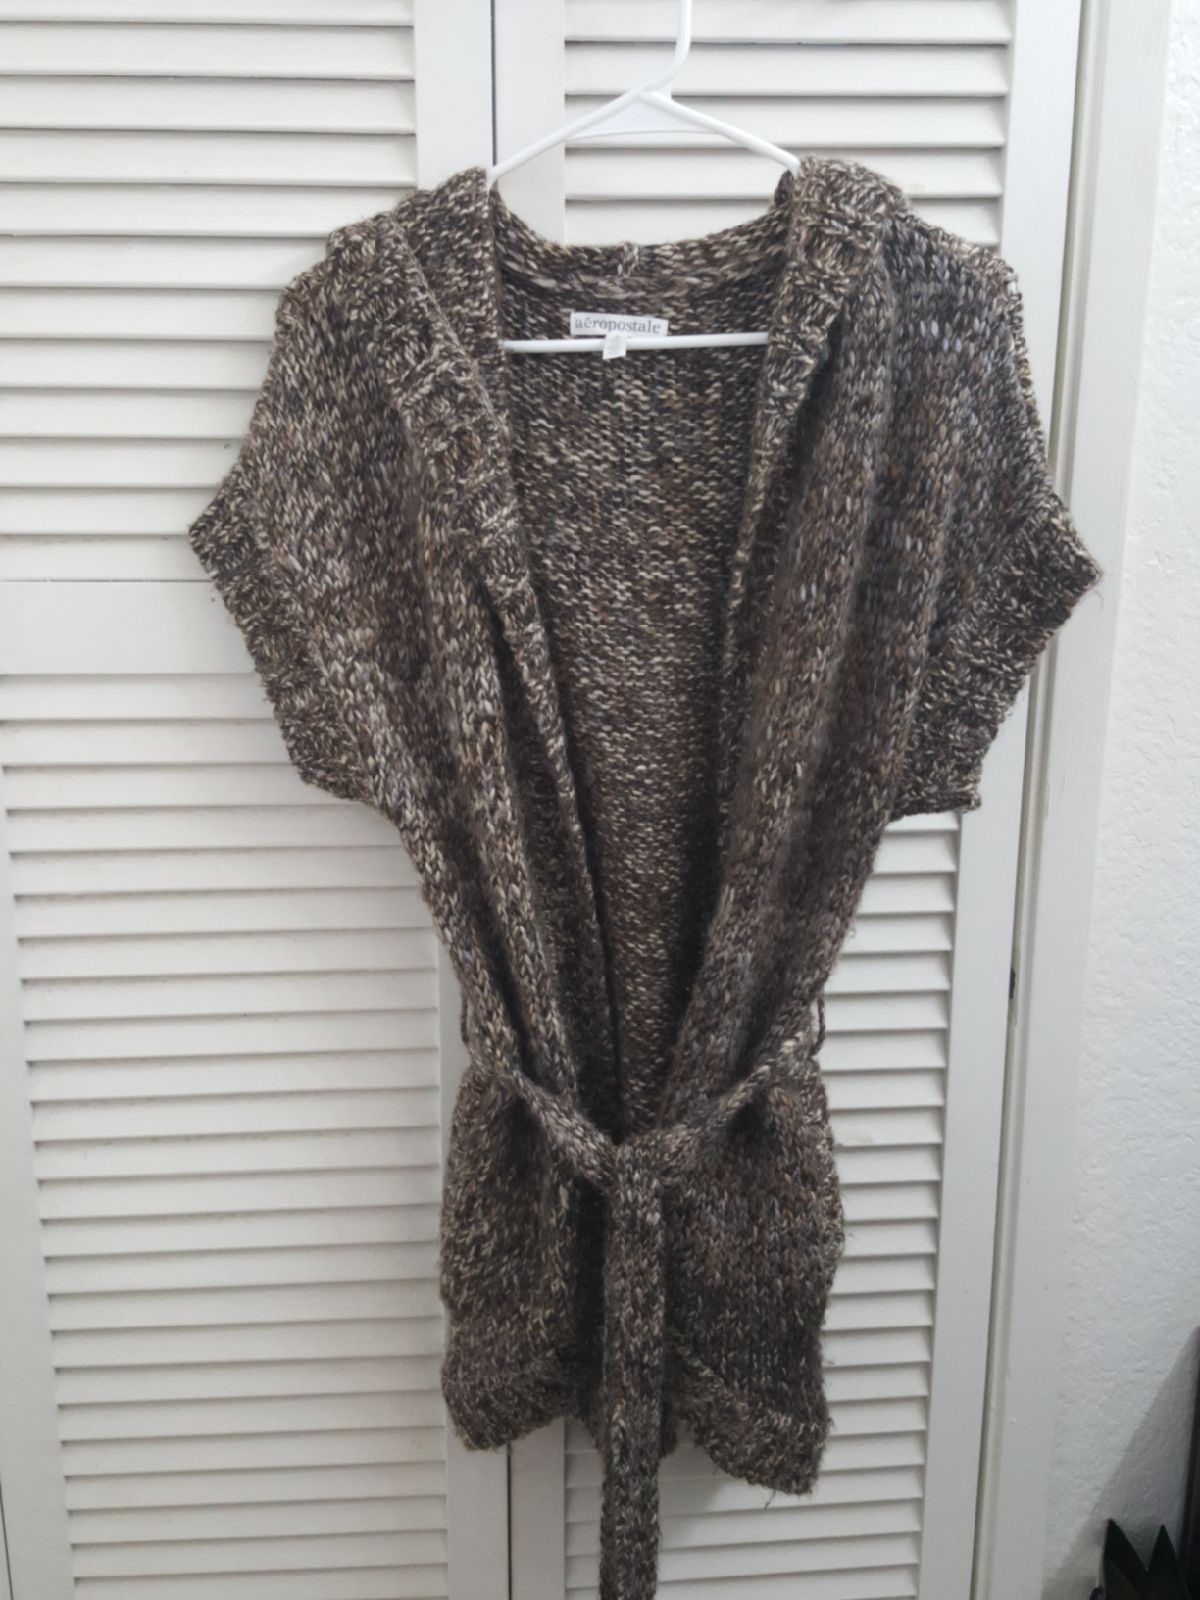 Wool short sleeve cardigan - Mercari: BUY & SELL THINGS YOU LOVE